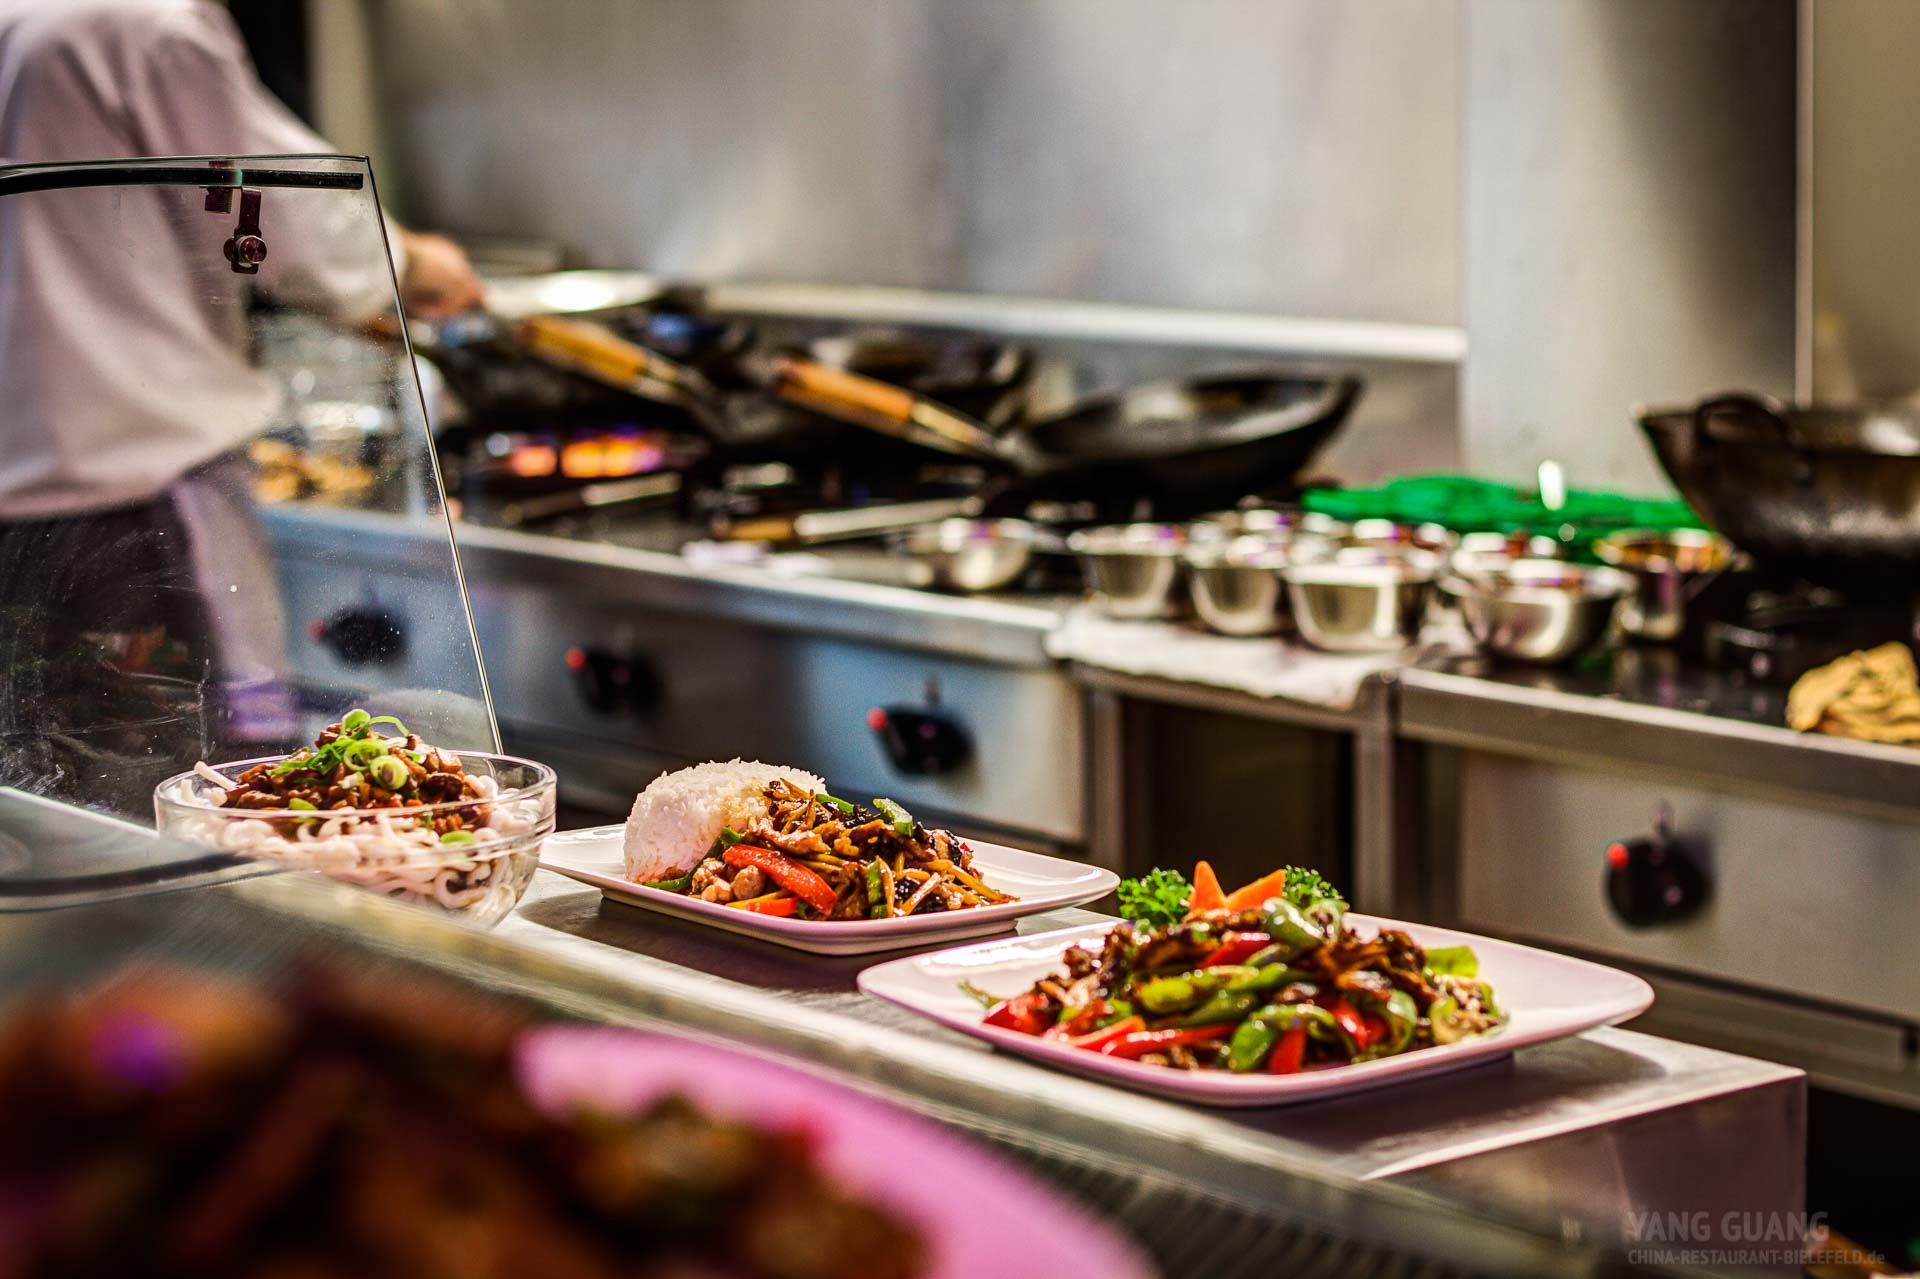 Yang Guang Restaurant